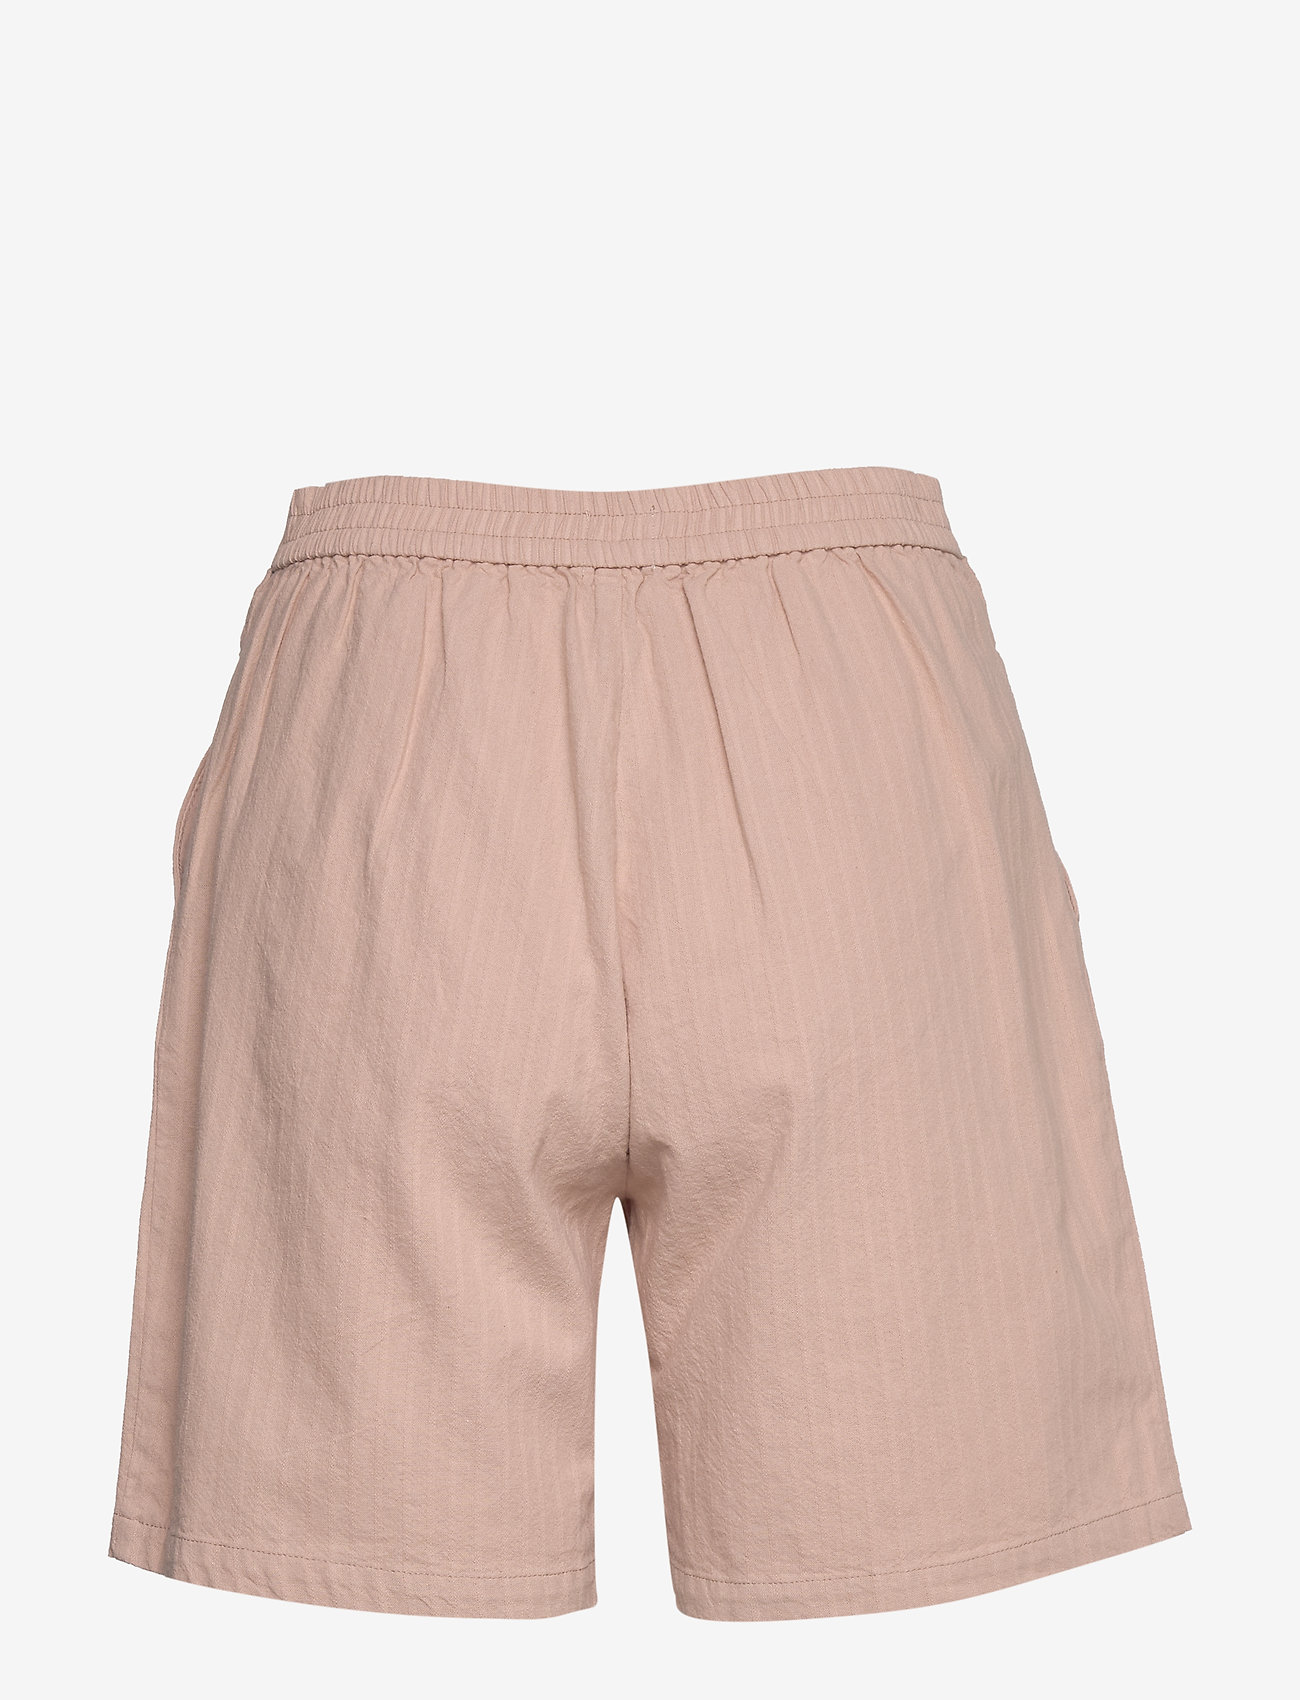 Livasz Shorts (Silver Pink) (19.98 €) - Saint Tropez mBxN6